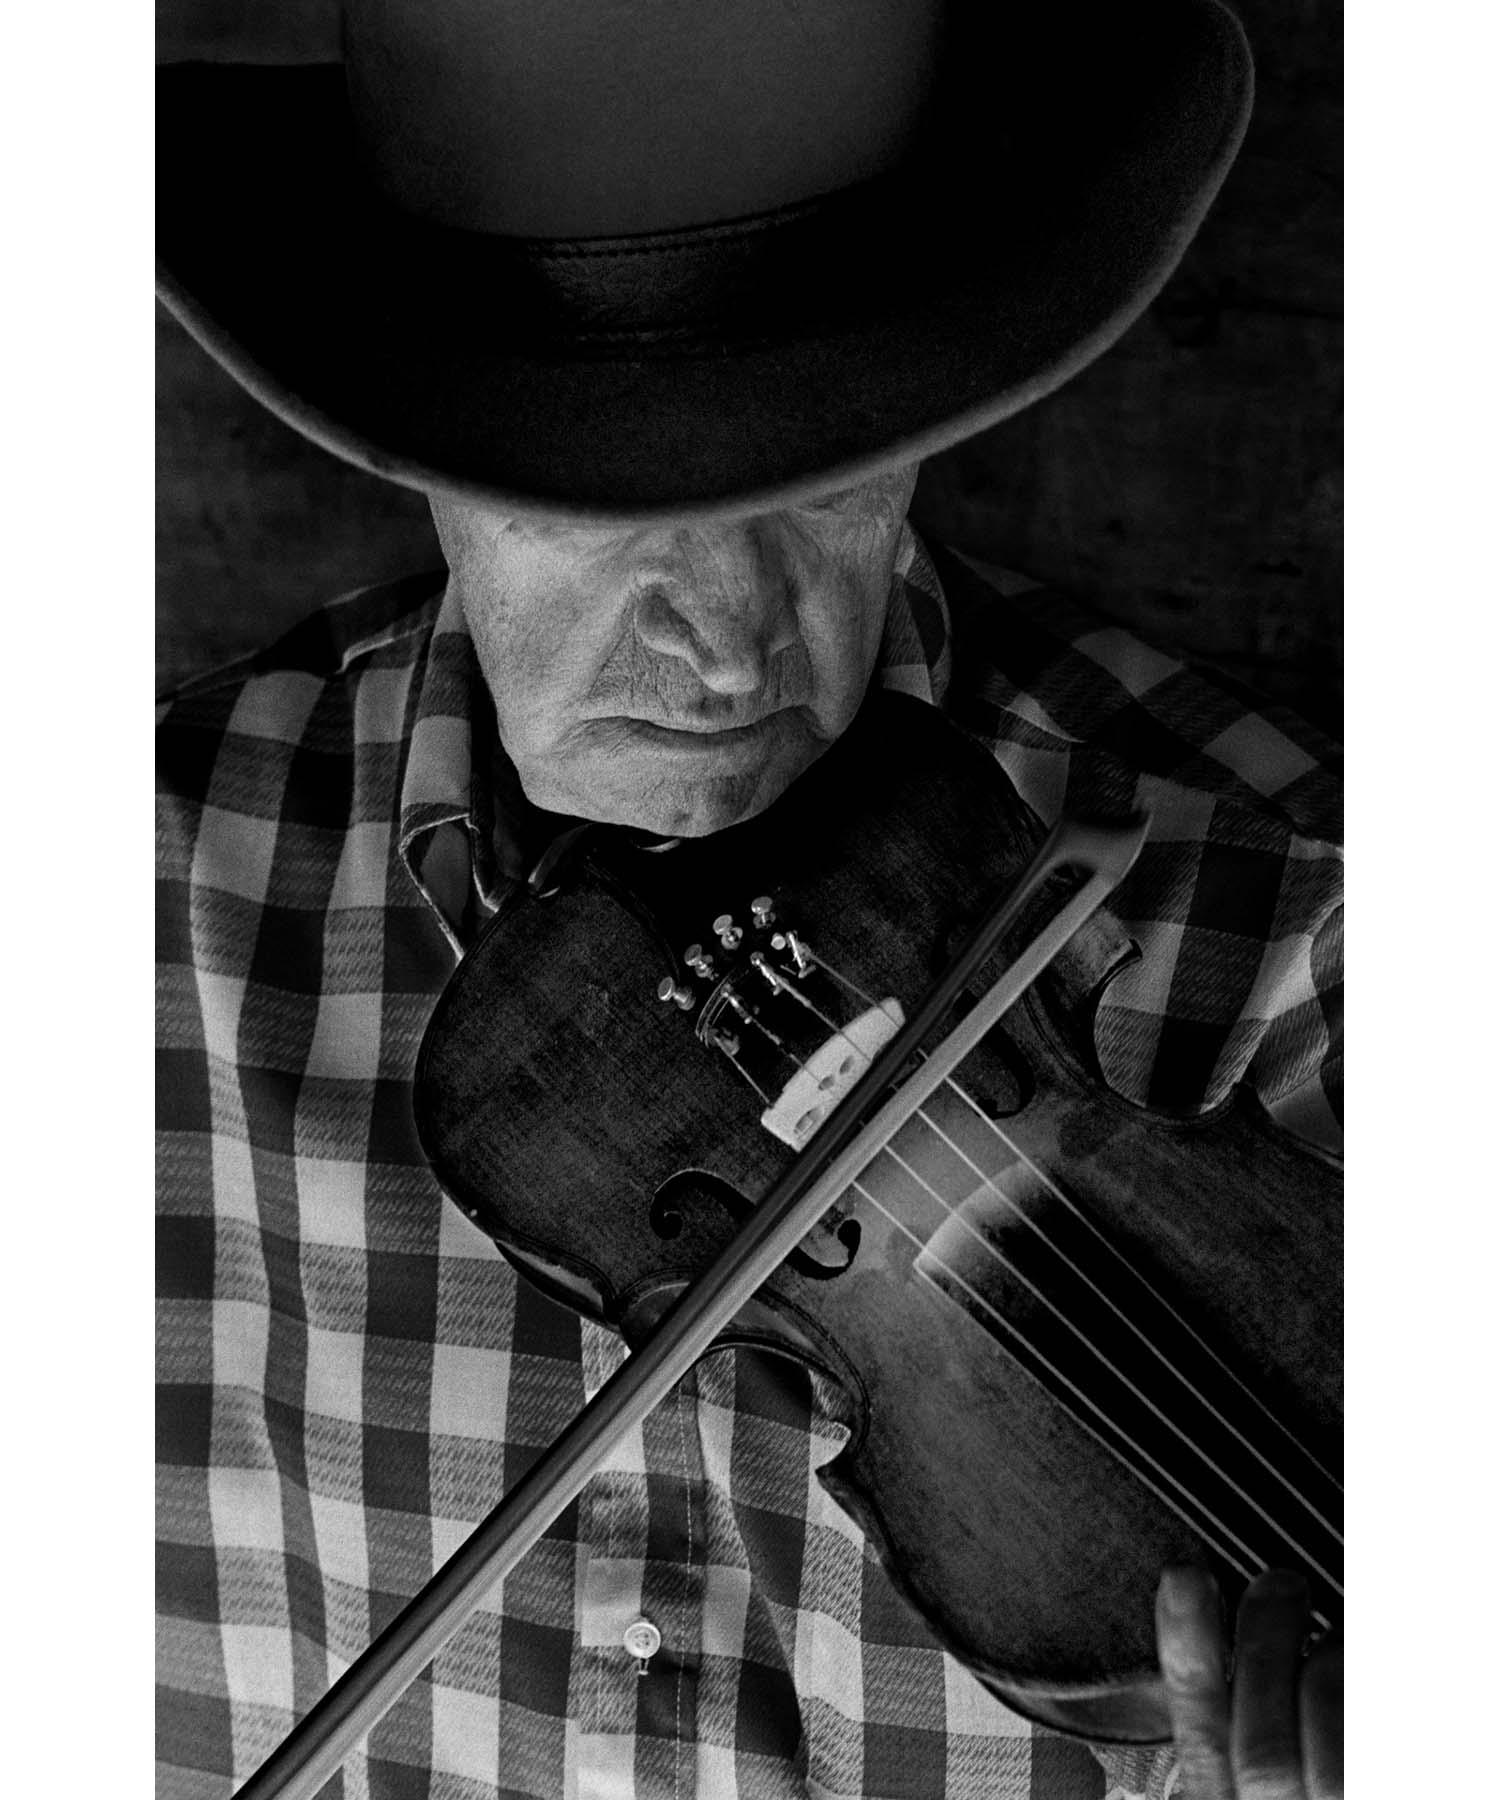 Byard Ray fiddle Appalachia music musician Tim Barnwell photography